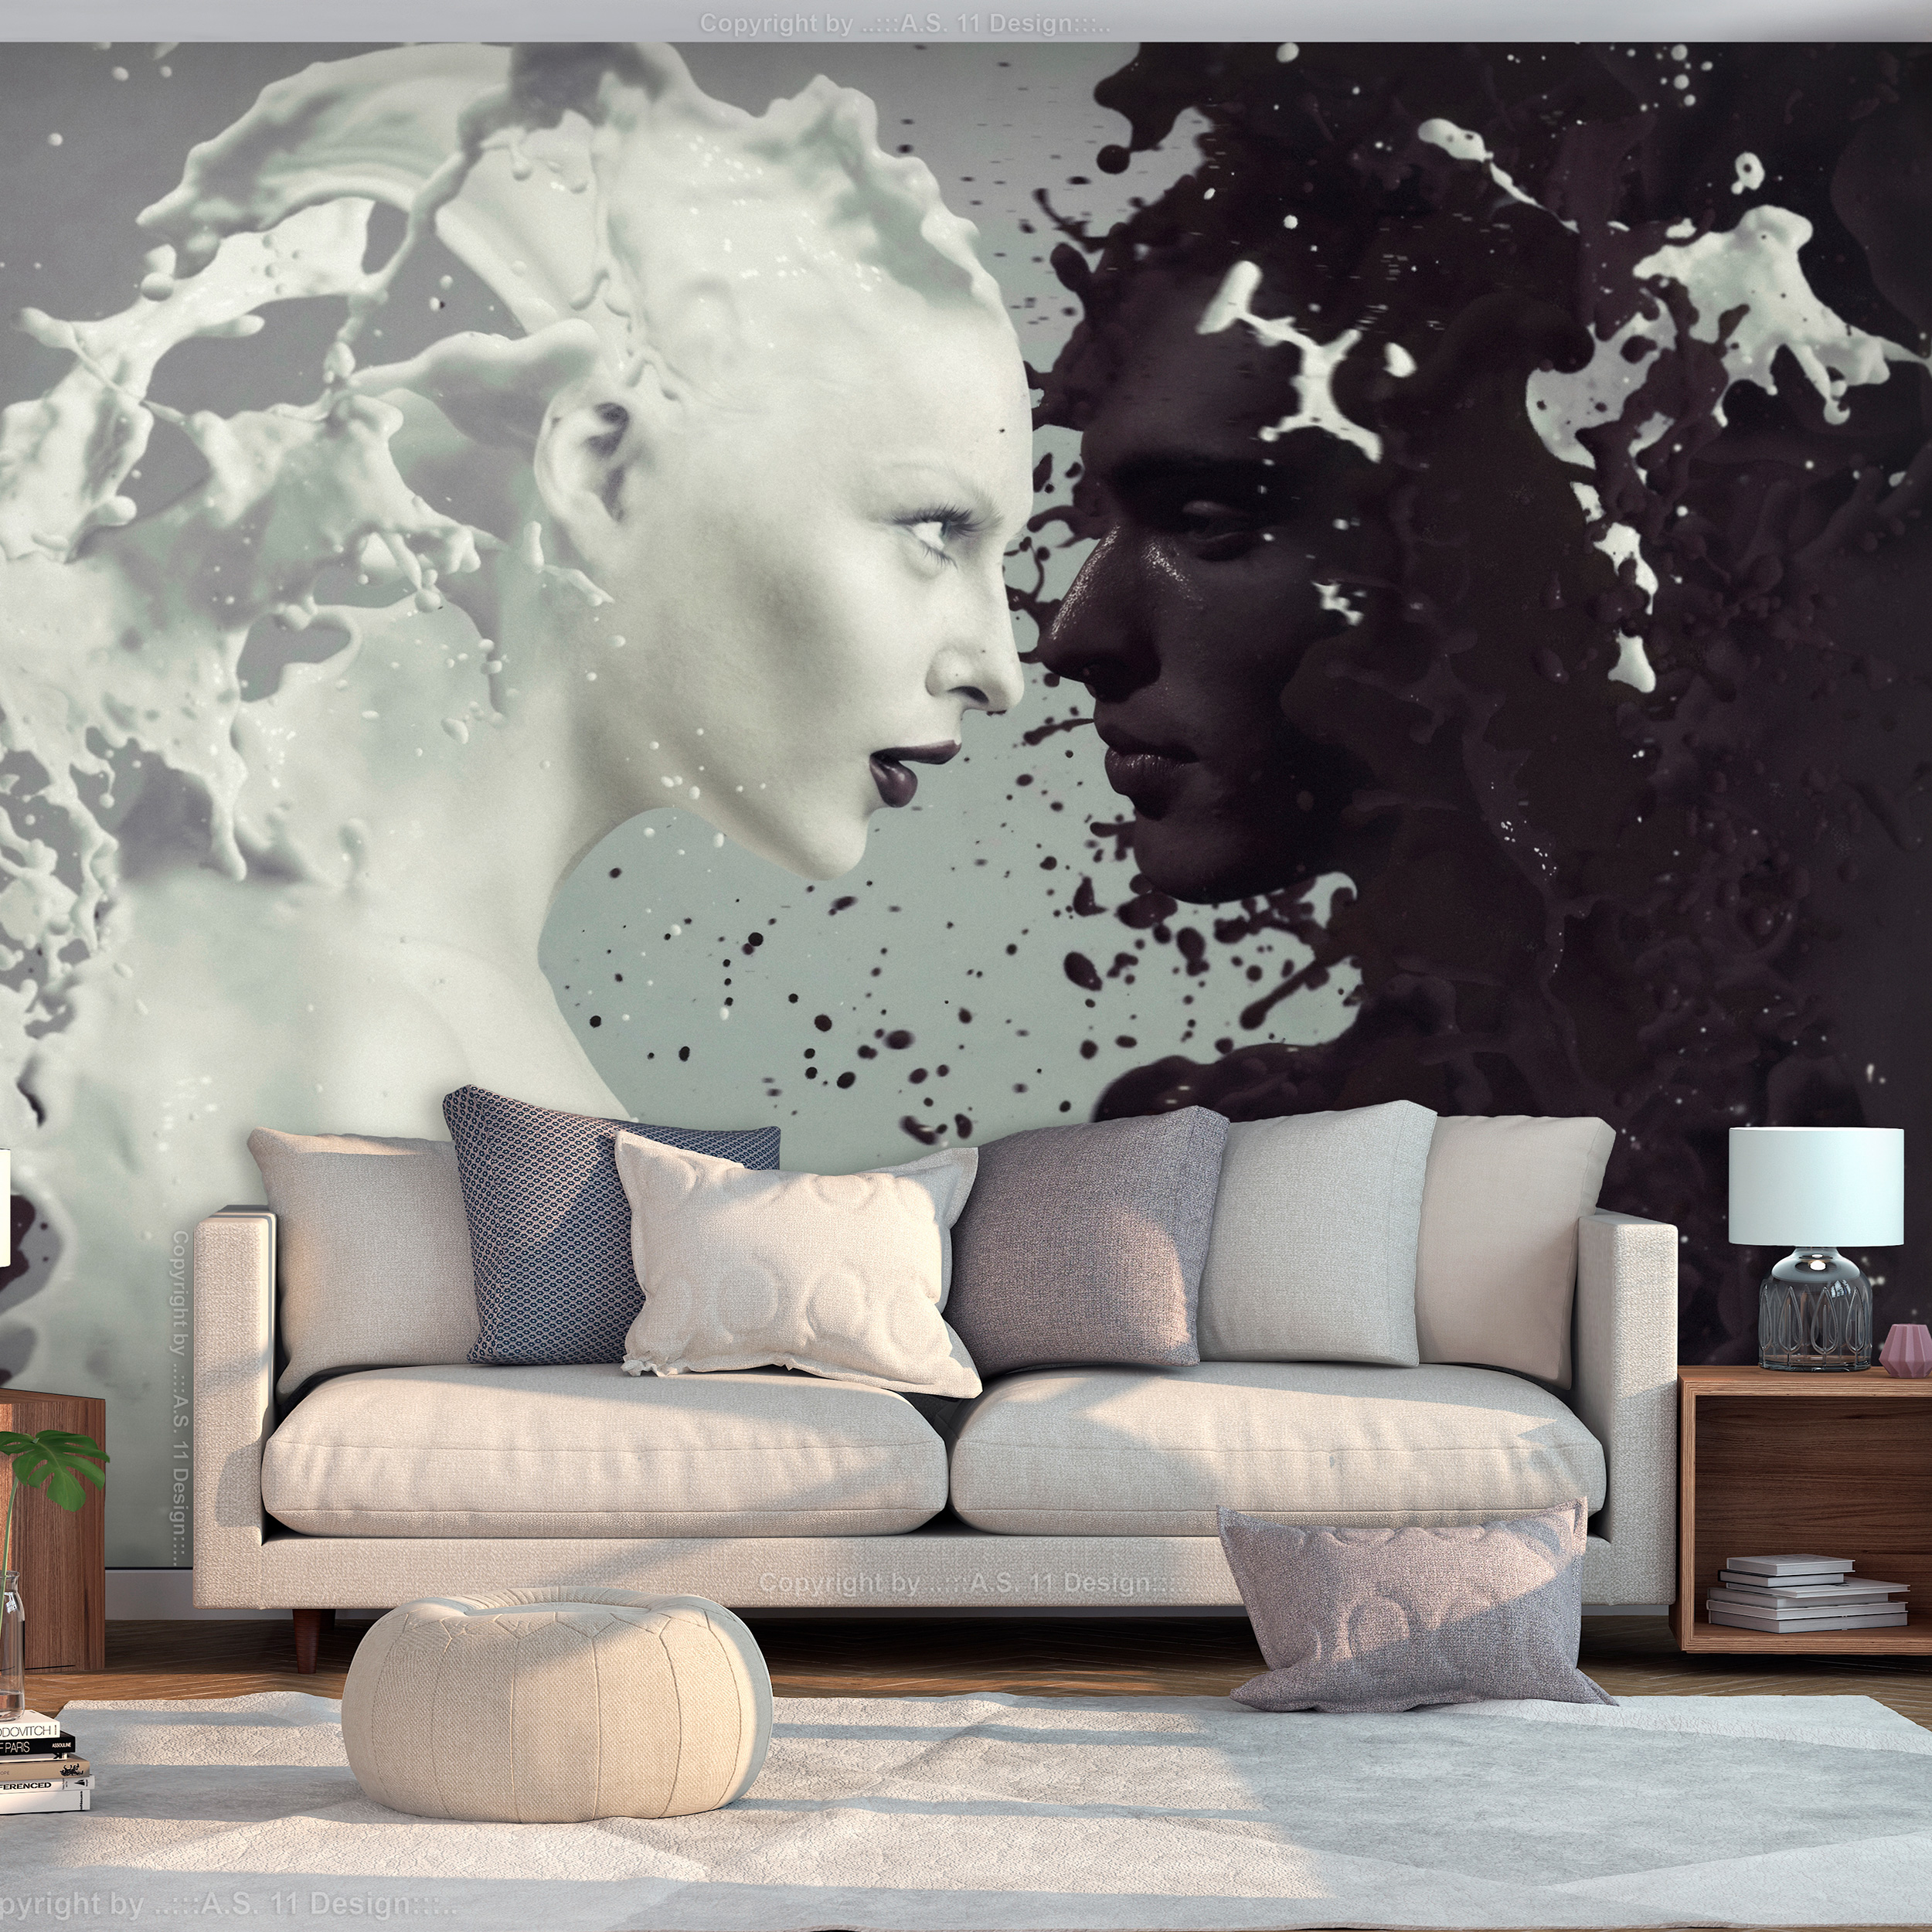 vlies fototapete abstrakt wei liebe paar schwarz grau tapete wandbilder xxl 042 ebay. Black Bedroom Furniture Sets. Home Design Ideas